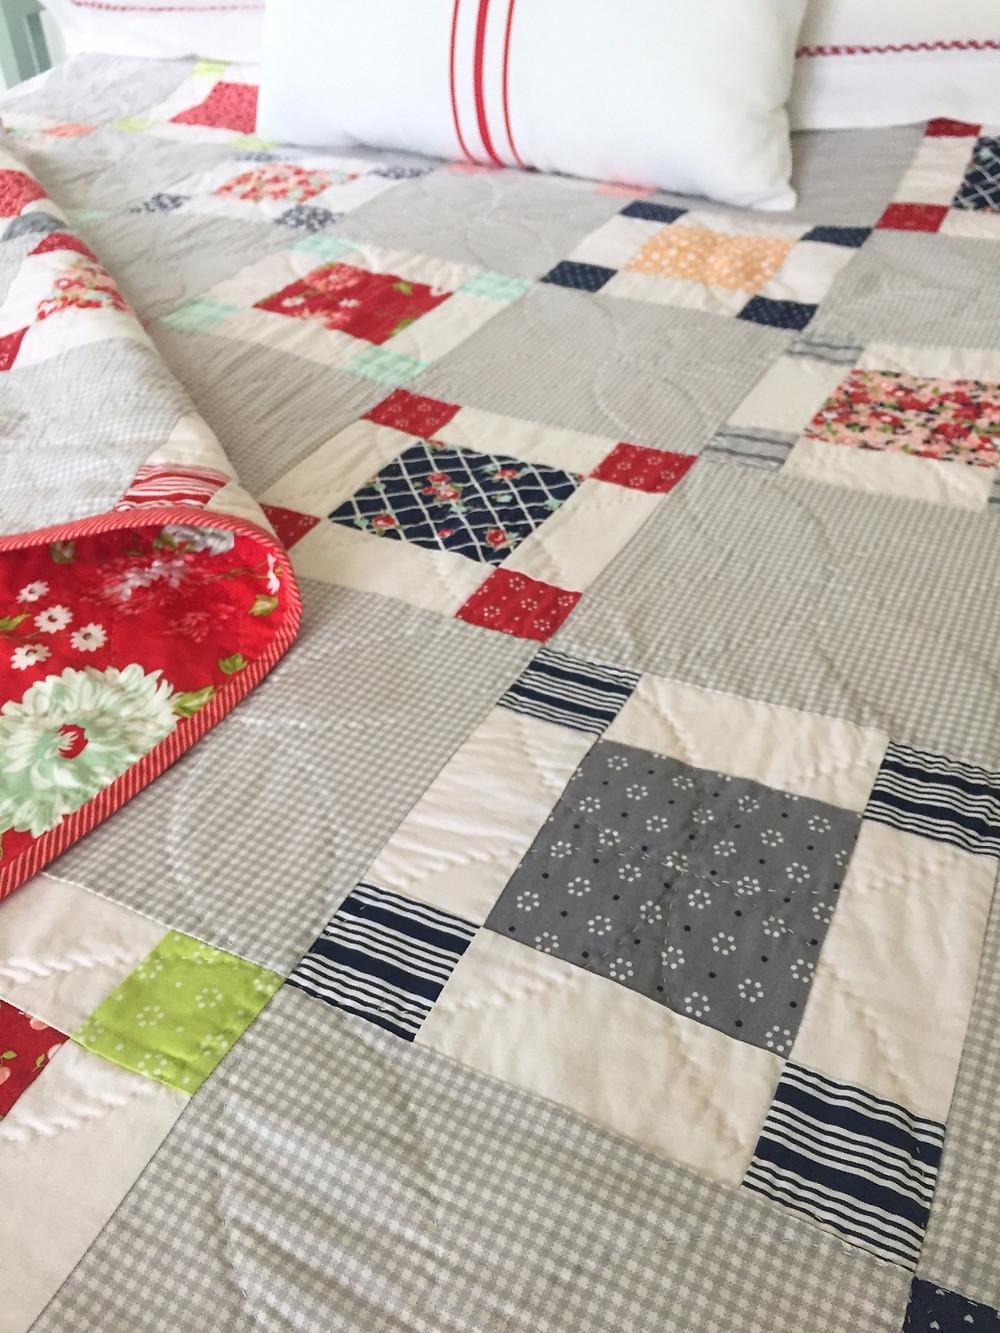 Hand Quilting Stitch Patterns : quilting, stitch, patterns, Simple, Quilting, Ideas...